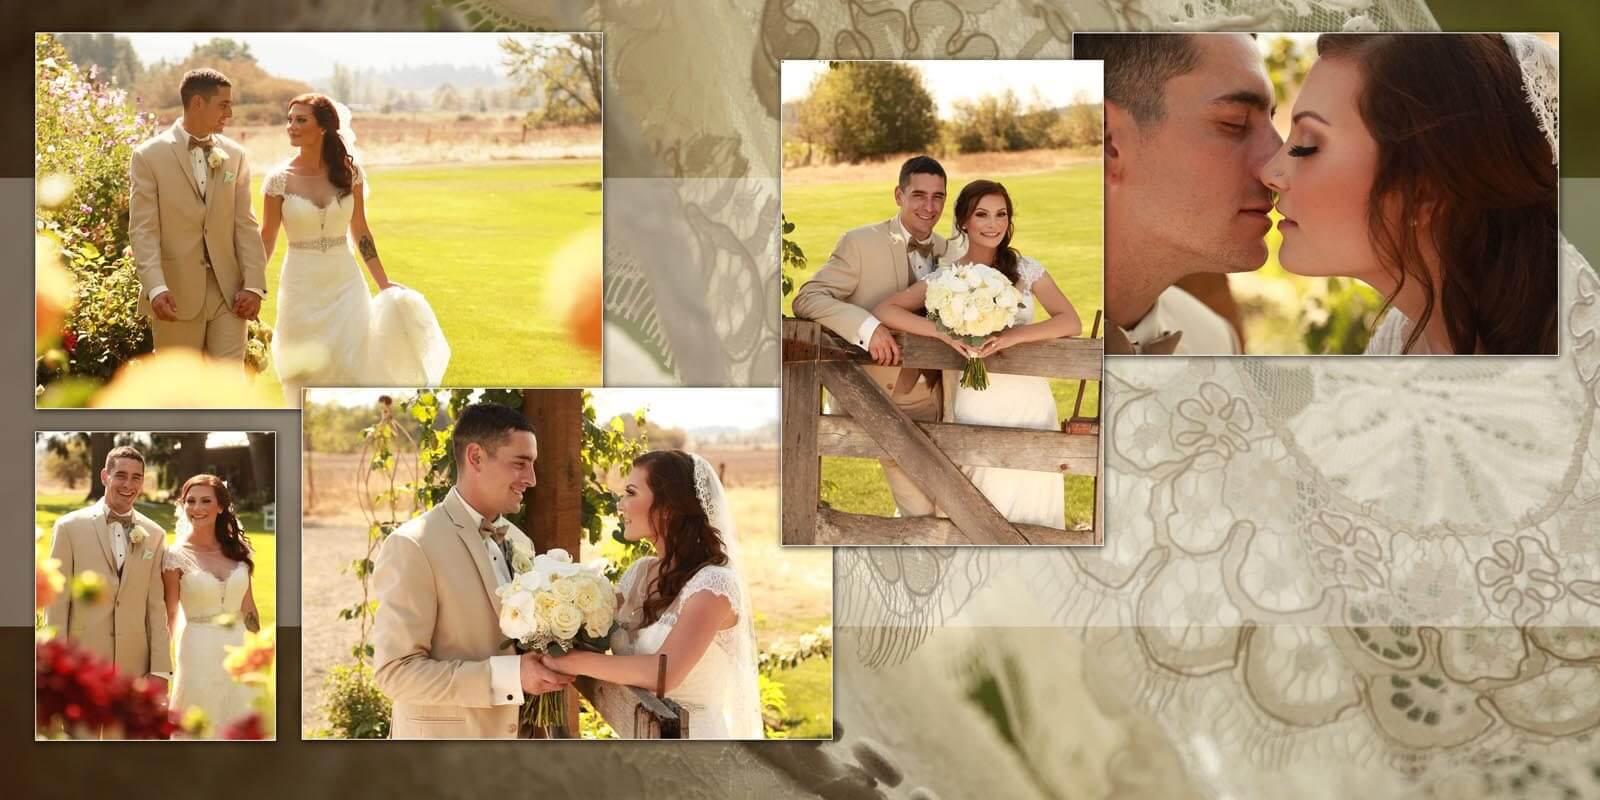 Jasper-House-Farm-Outdoor-Wedding-Lane-County-Oregon-photographers-014-015.jpg